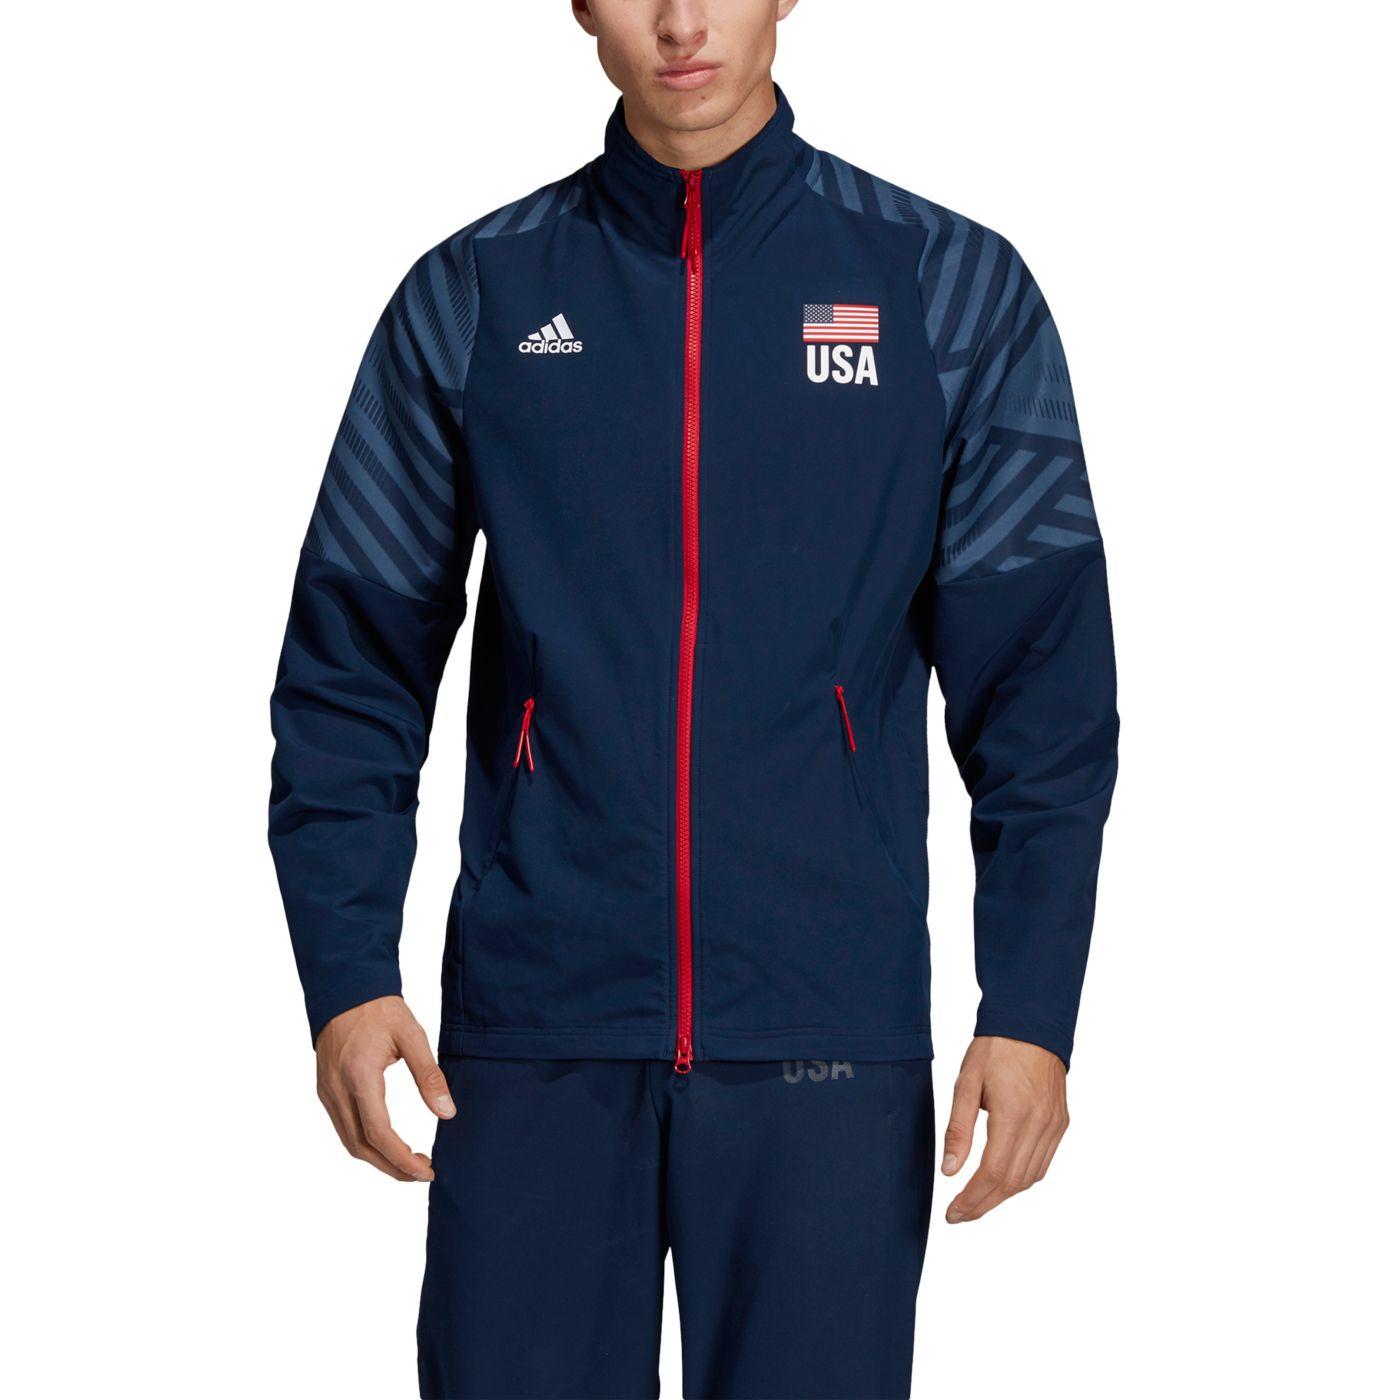 Adidas Men's USA Volleyball Warm-Up Jacket